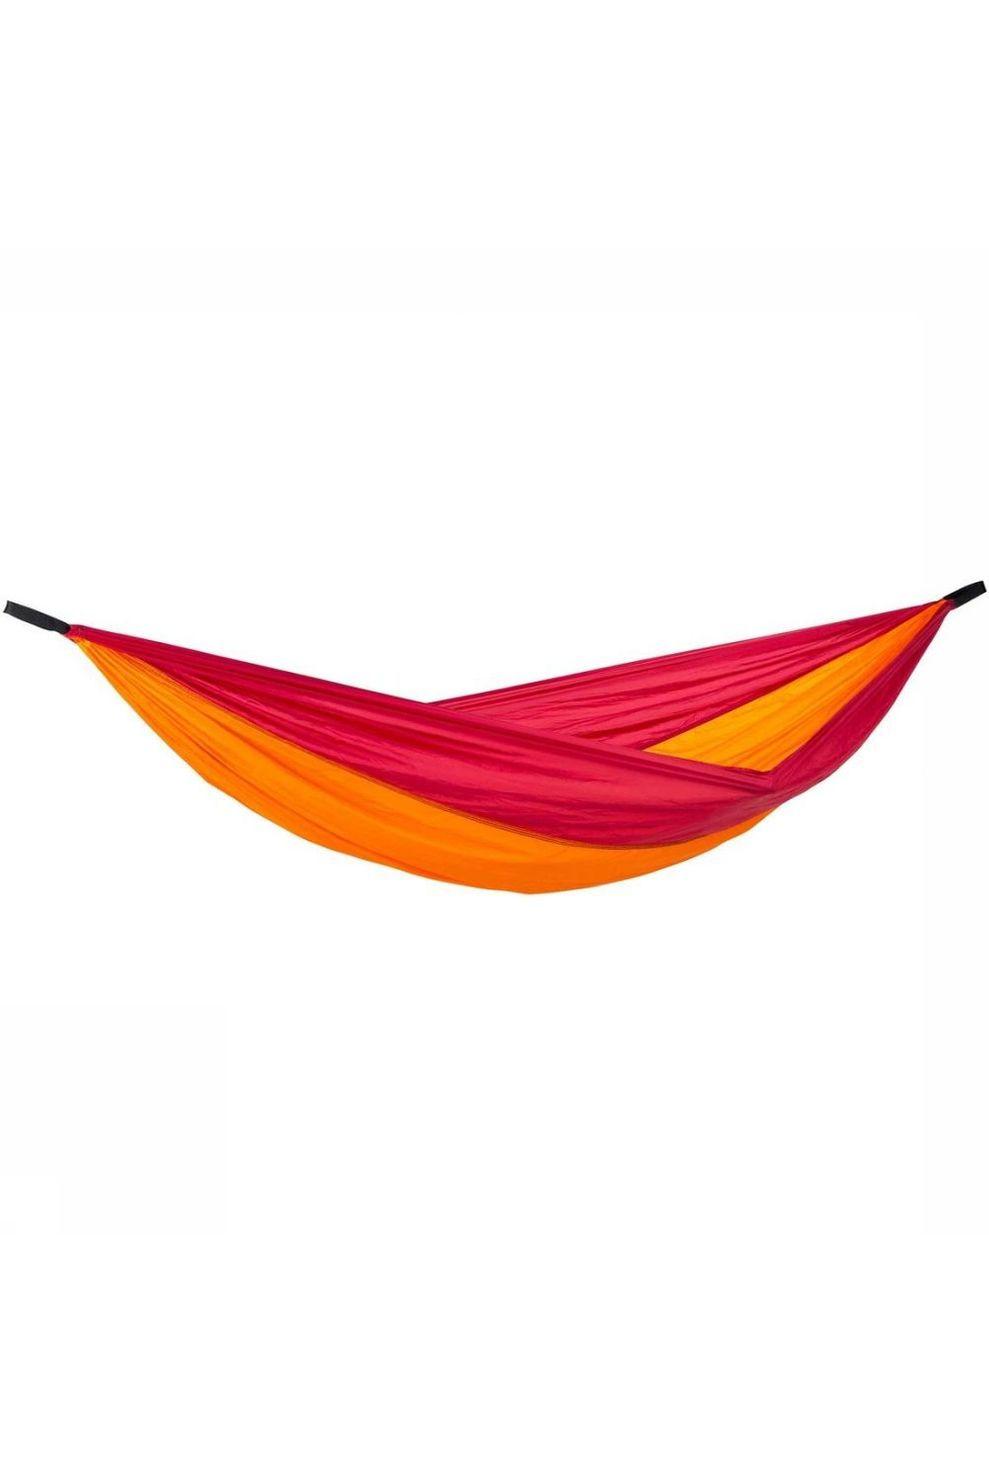 Amazonas Hangmat Adventure Hammock - Rood/Oranje